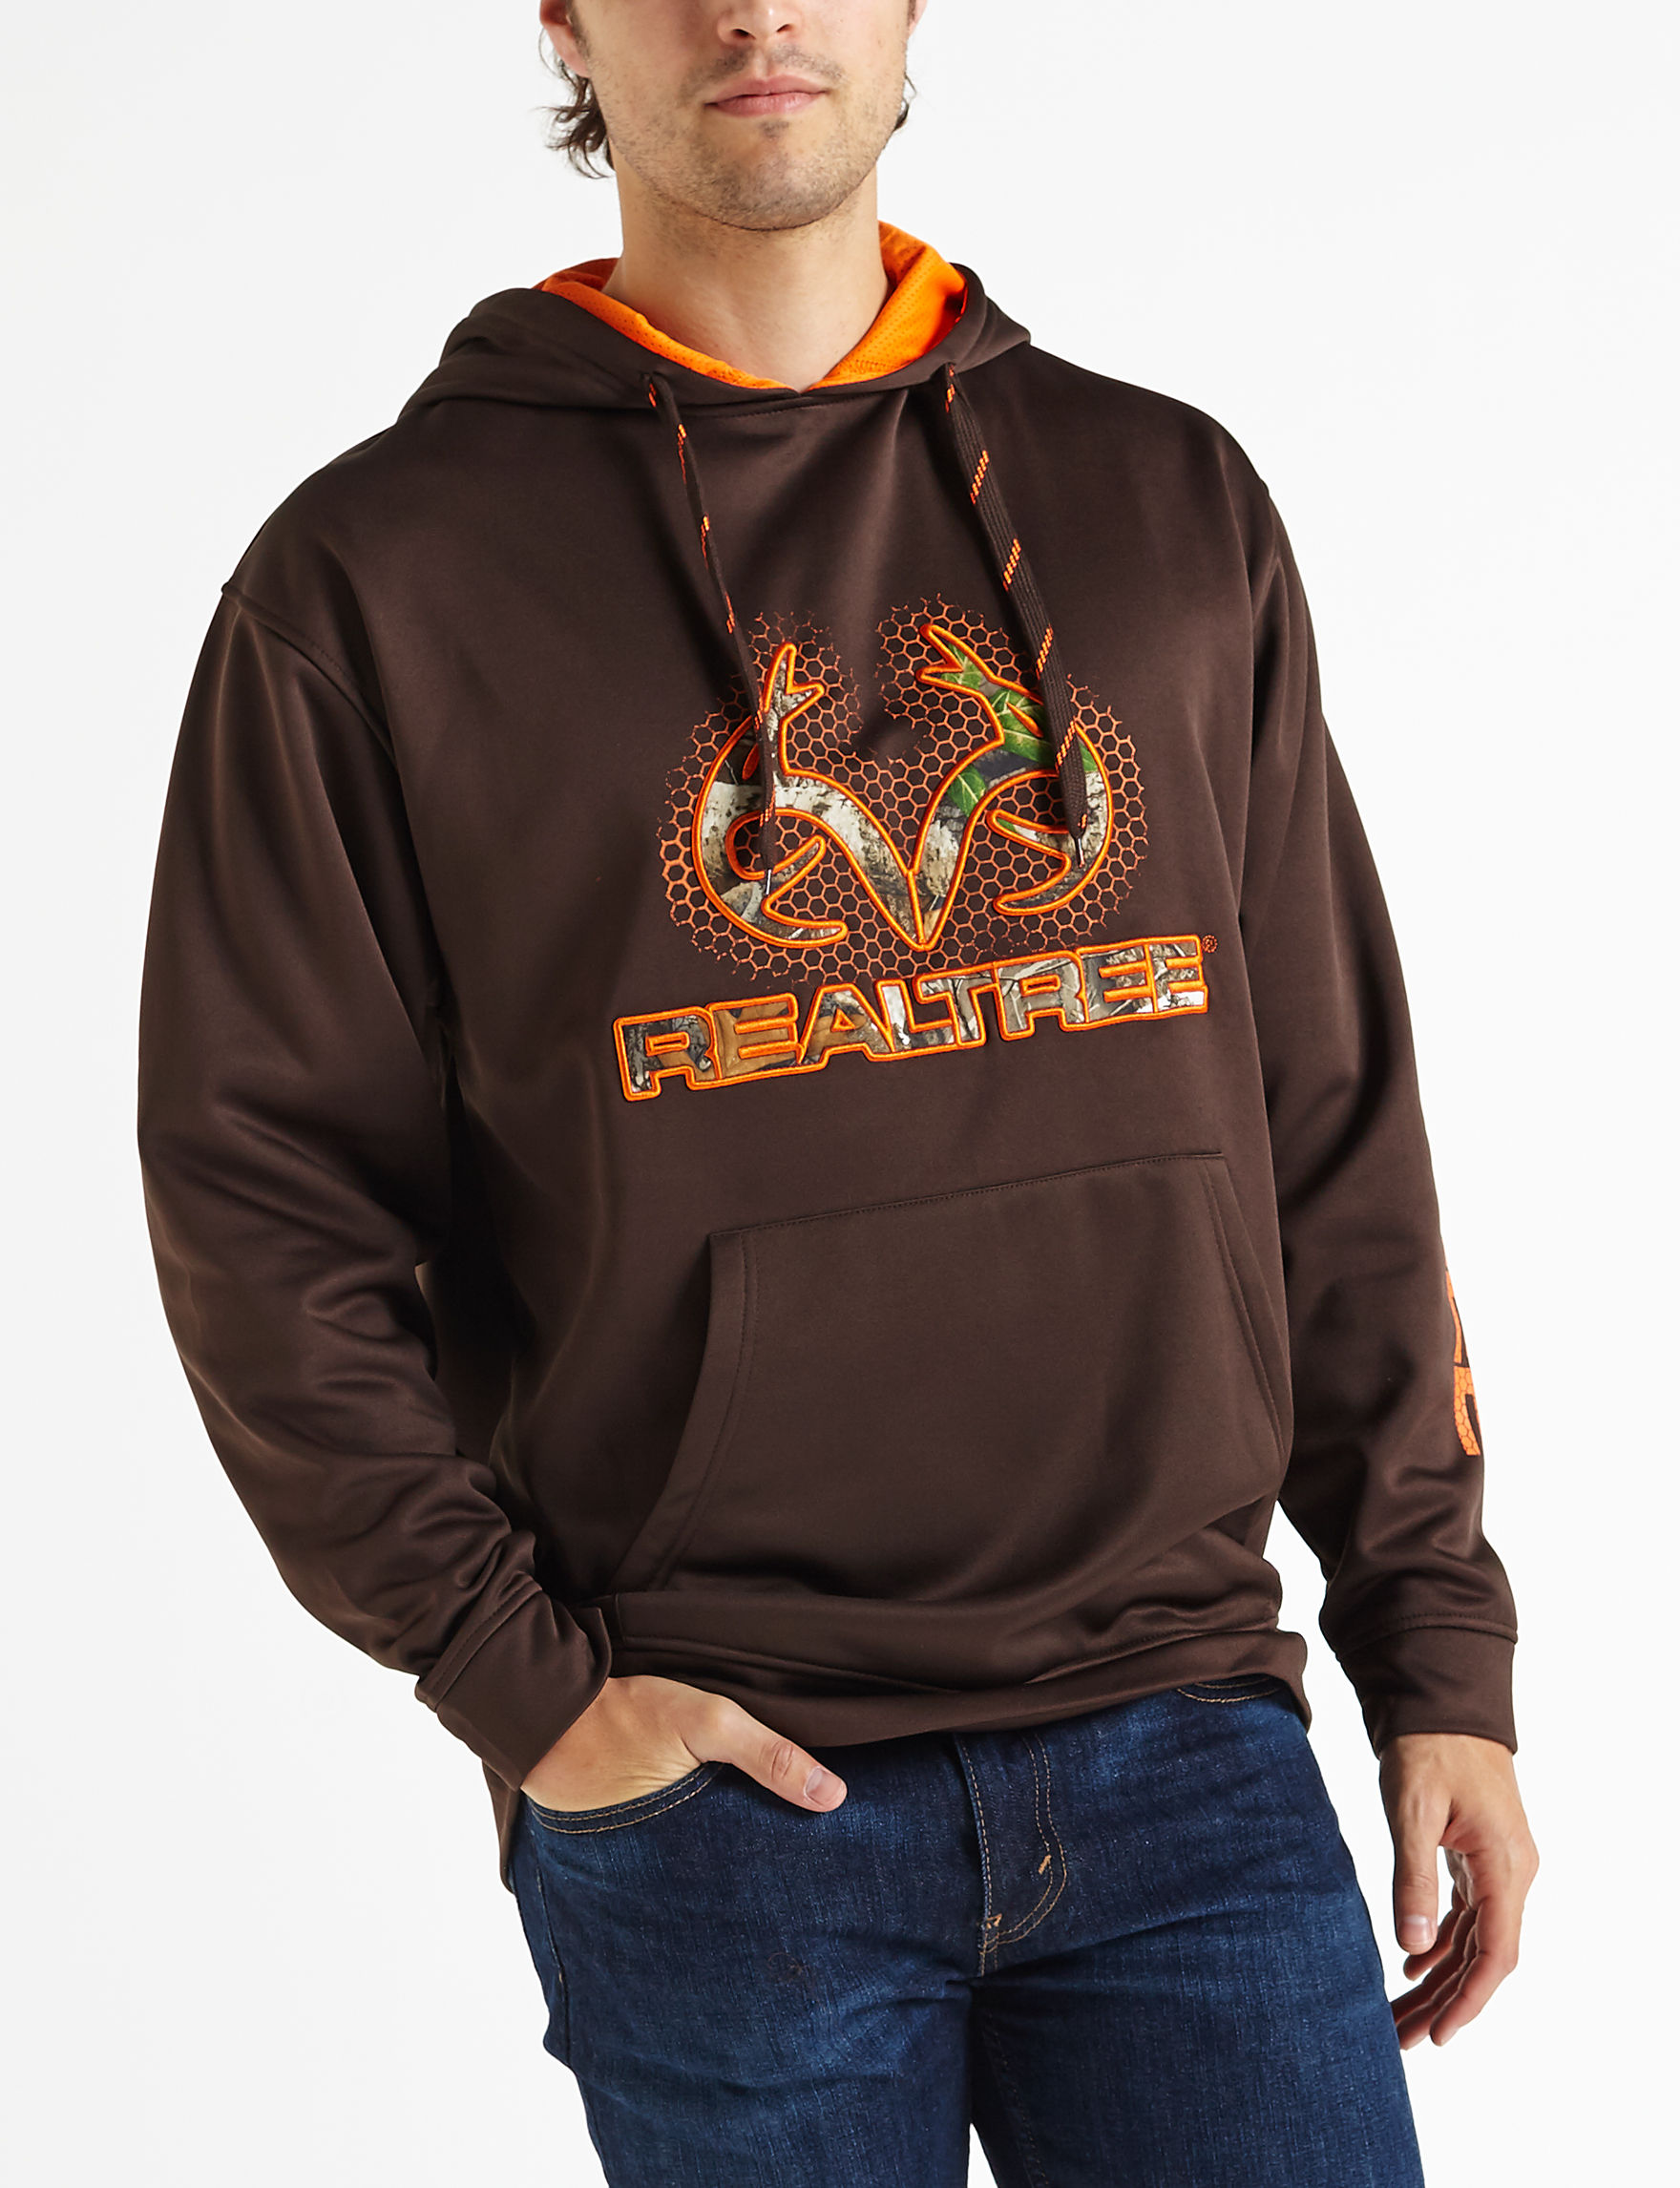 Realtree Brown / Orange Pull-overs